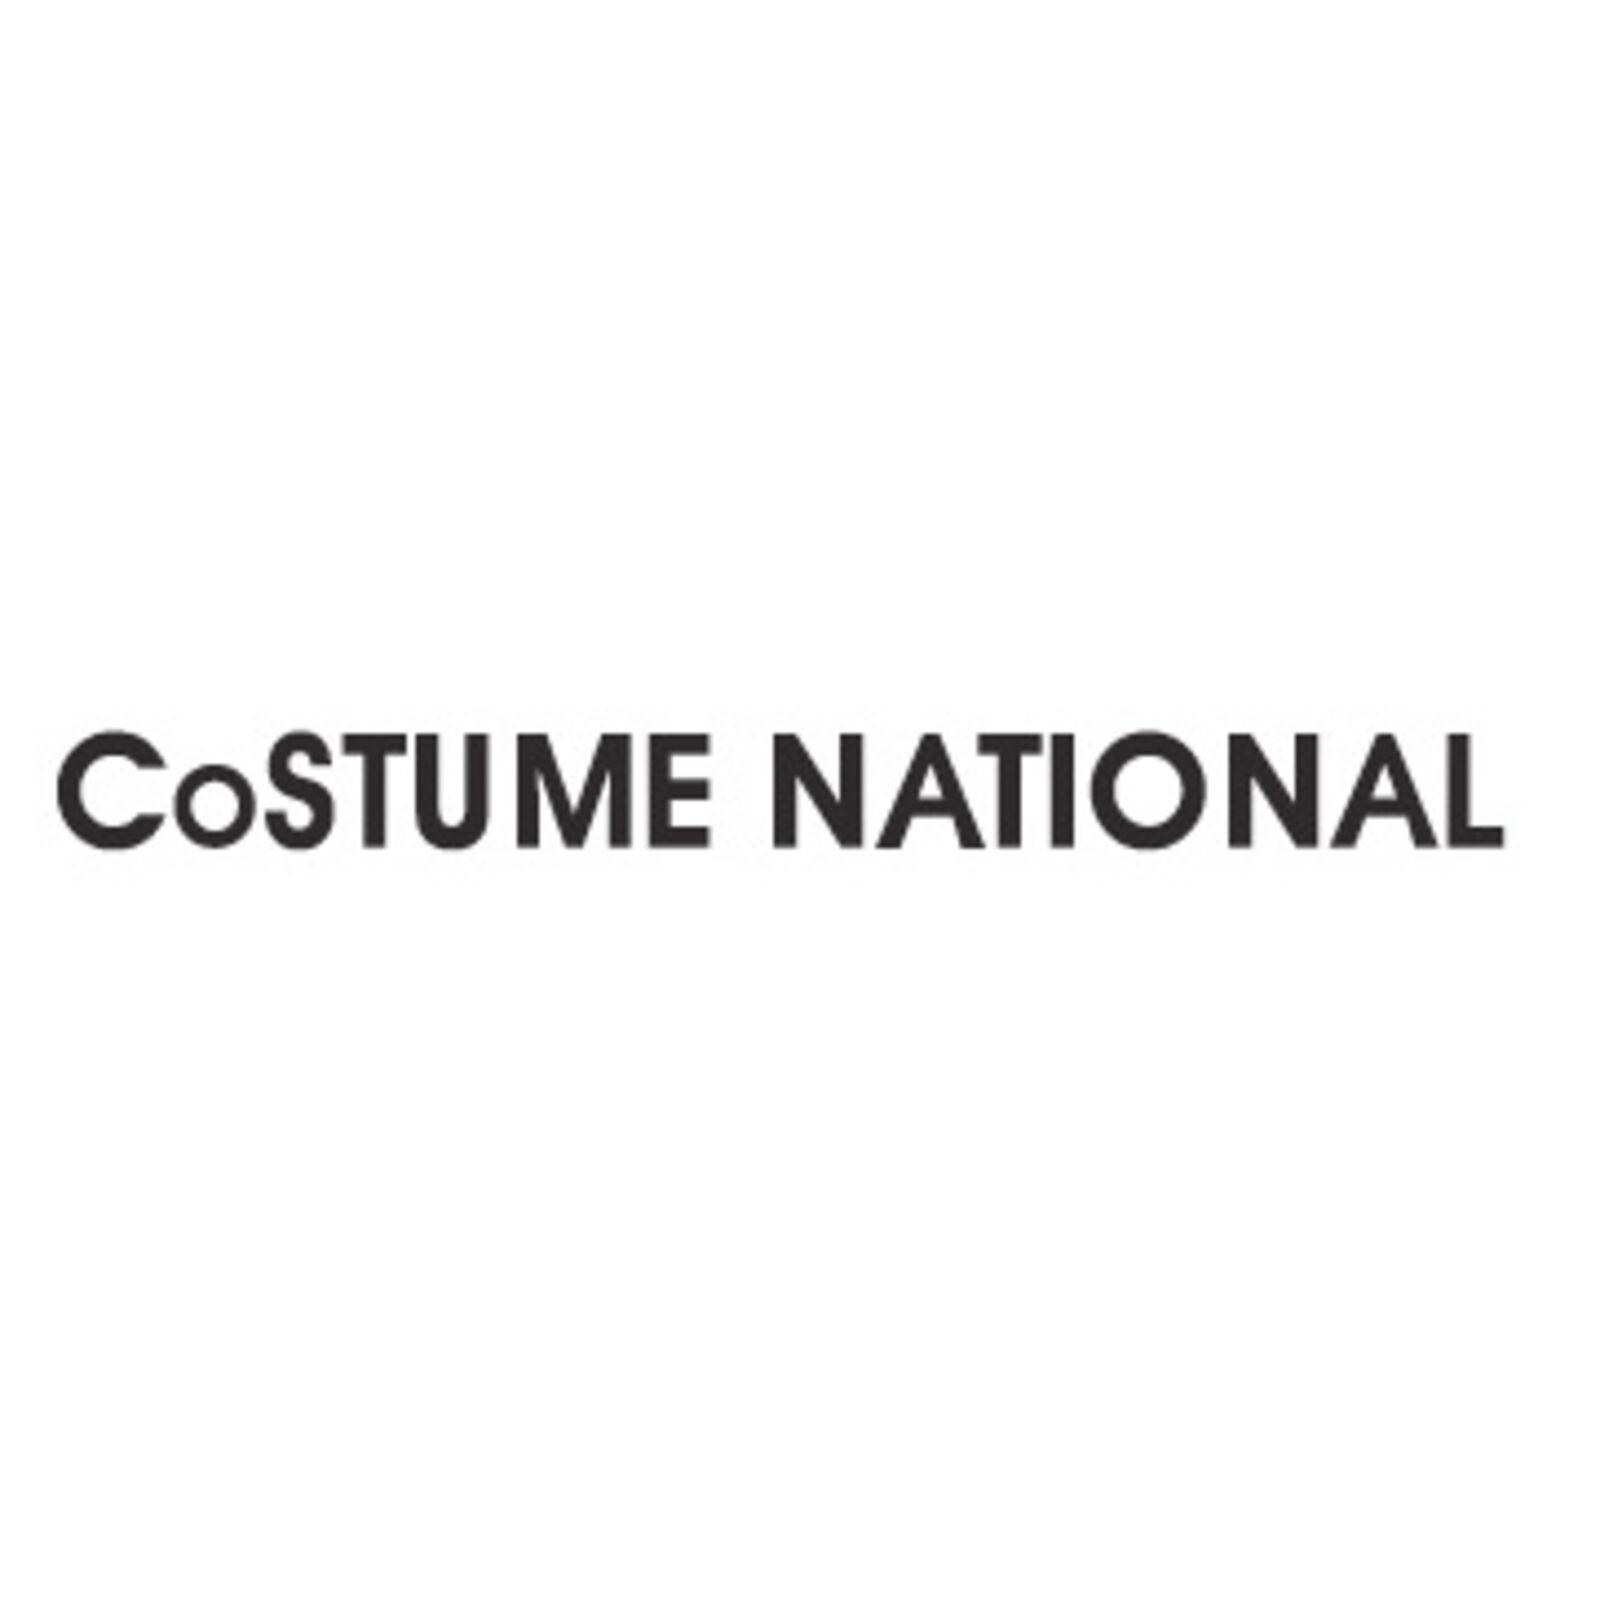 CoSTUME NATIONAL (Image 1)